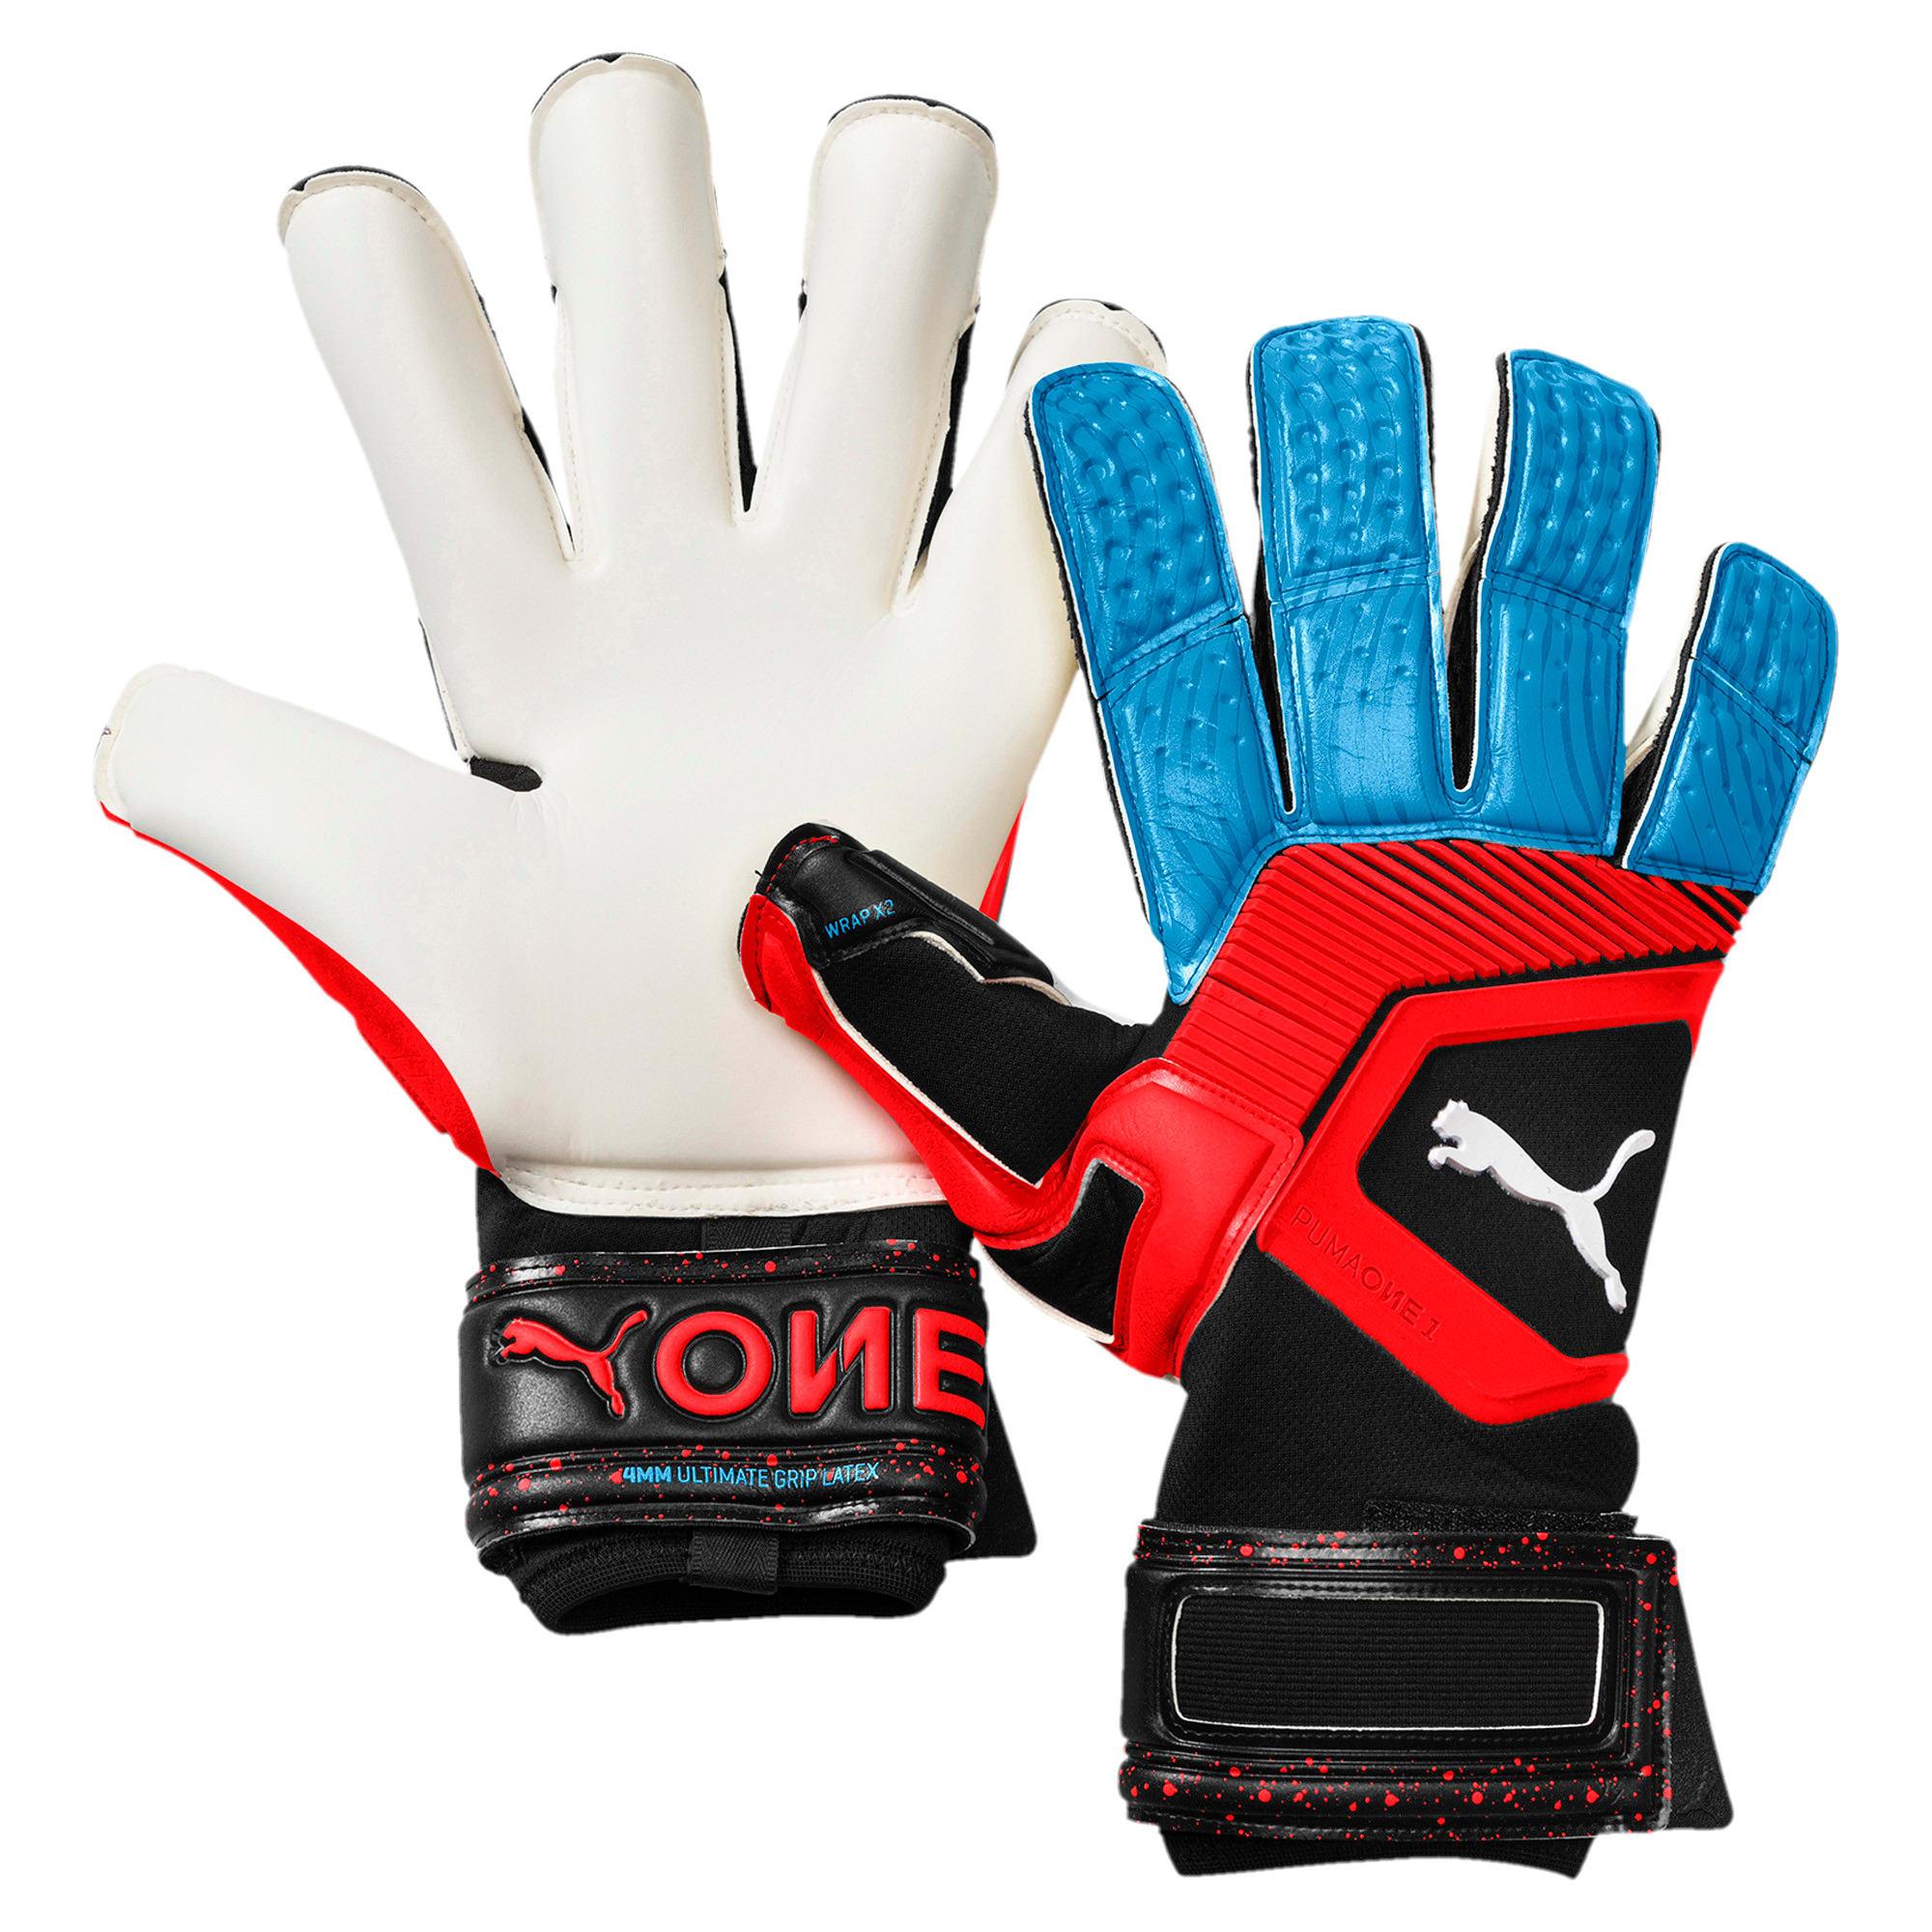 Thumbnail 1 of PUMA ONE Grip 1 Hybrid Pro Goalkeeper Gloves, Black-Bleu Azur-Red Blast, medium